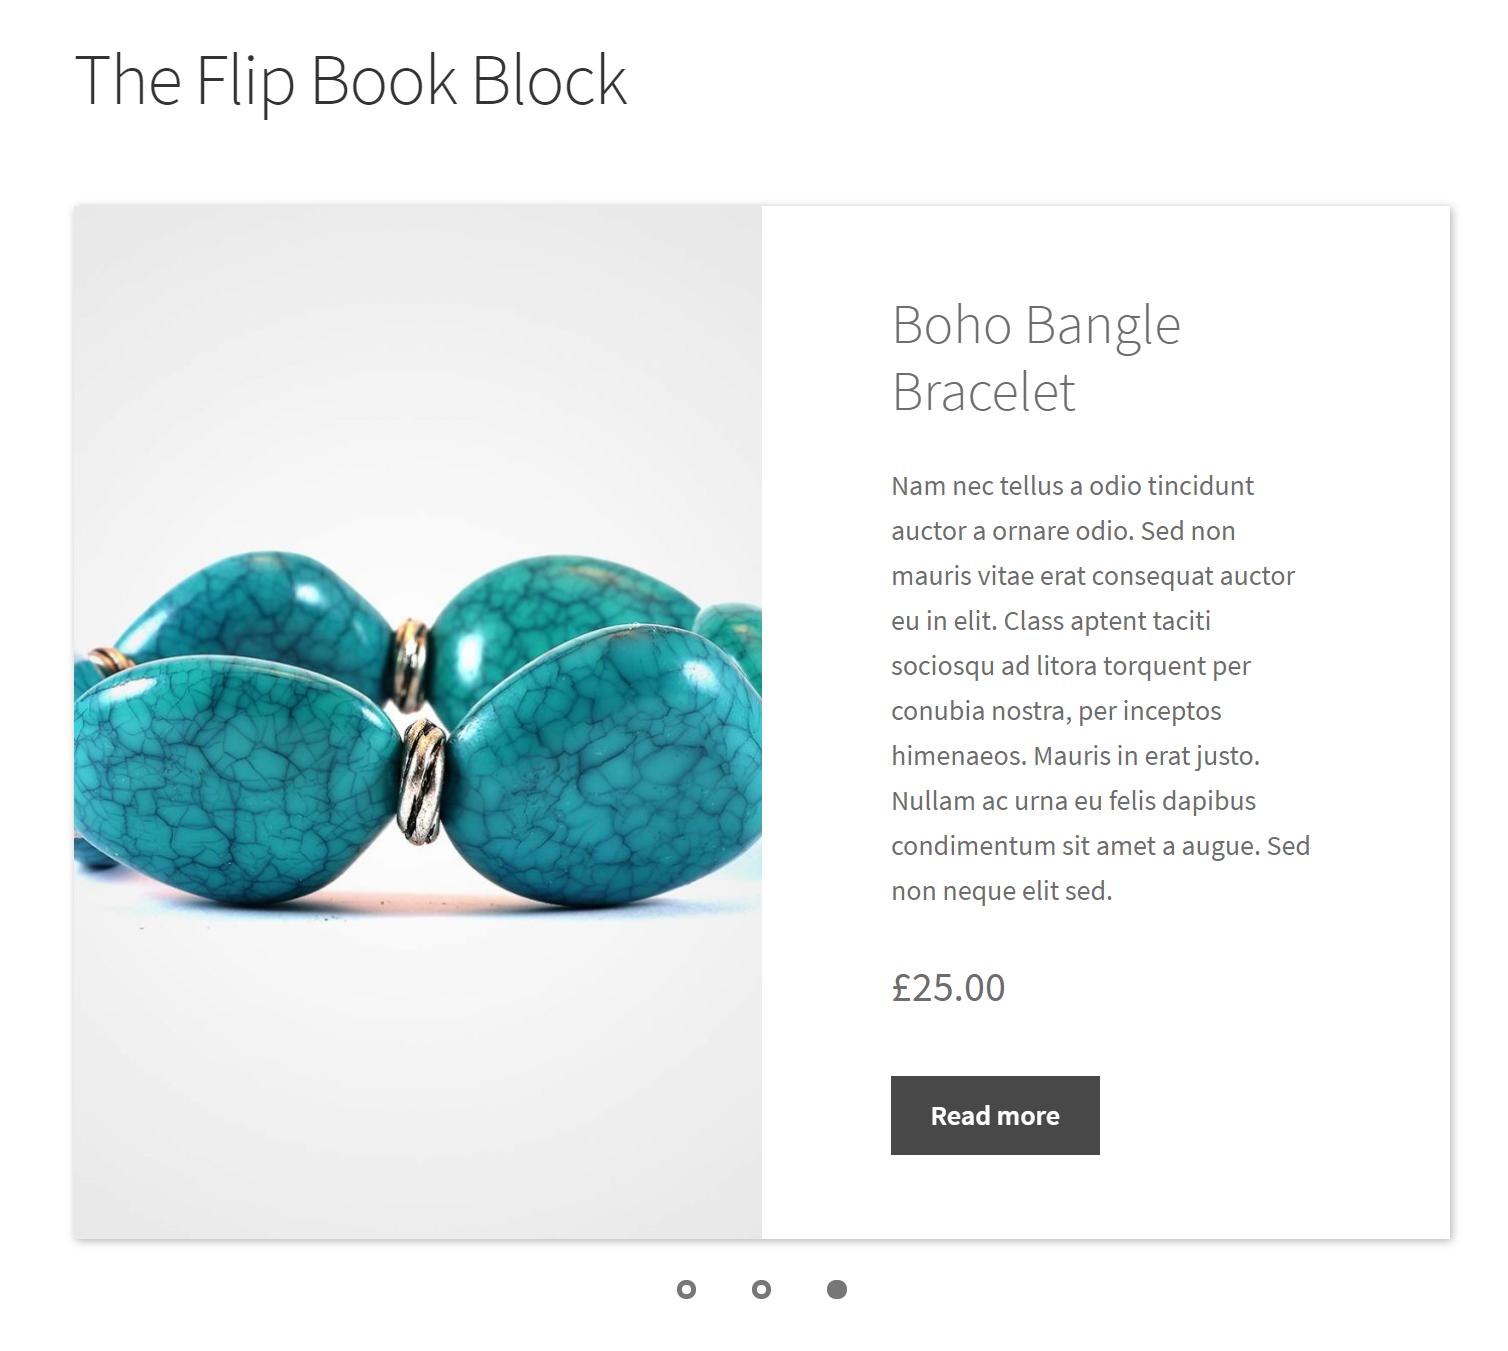 Flip Book Block